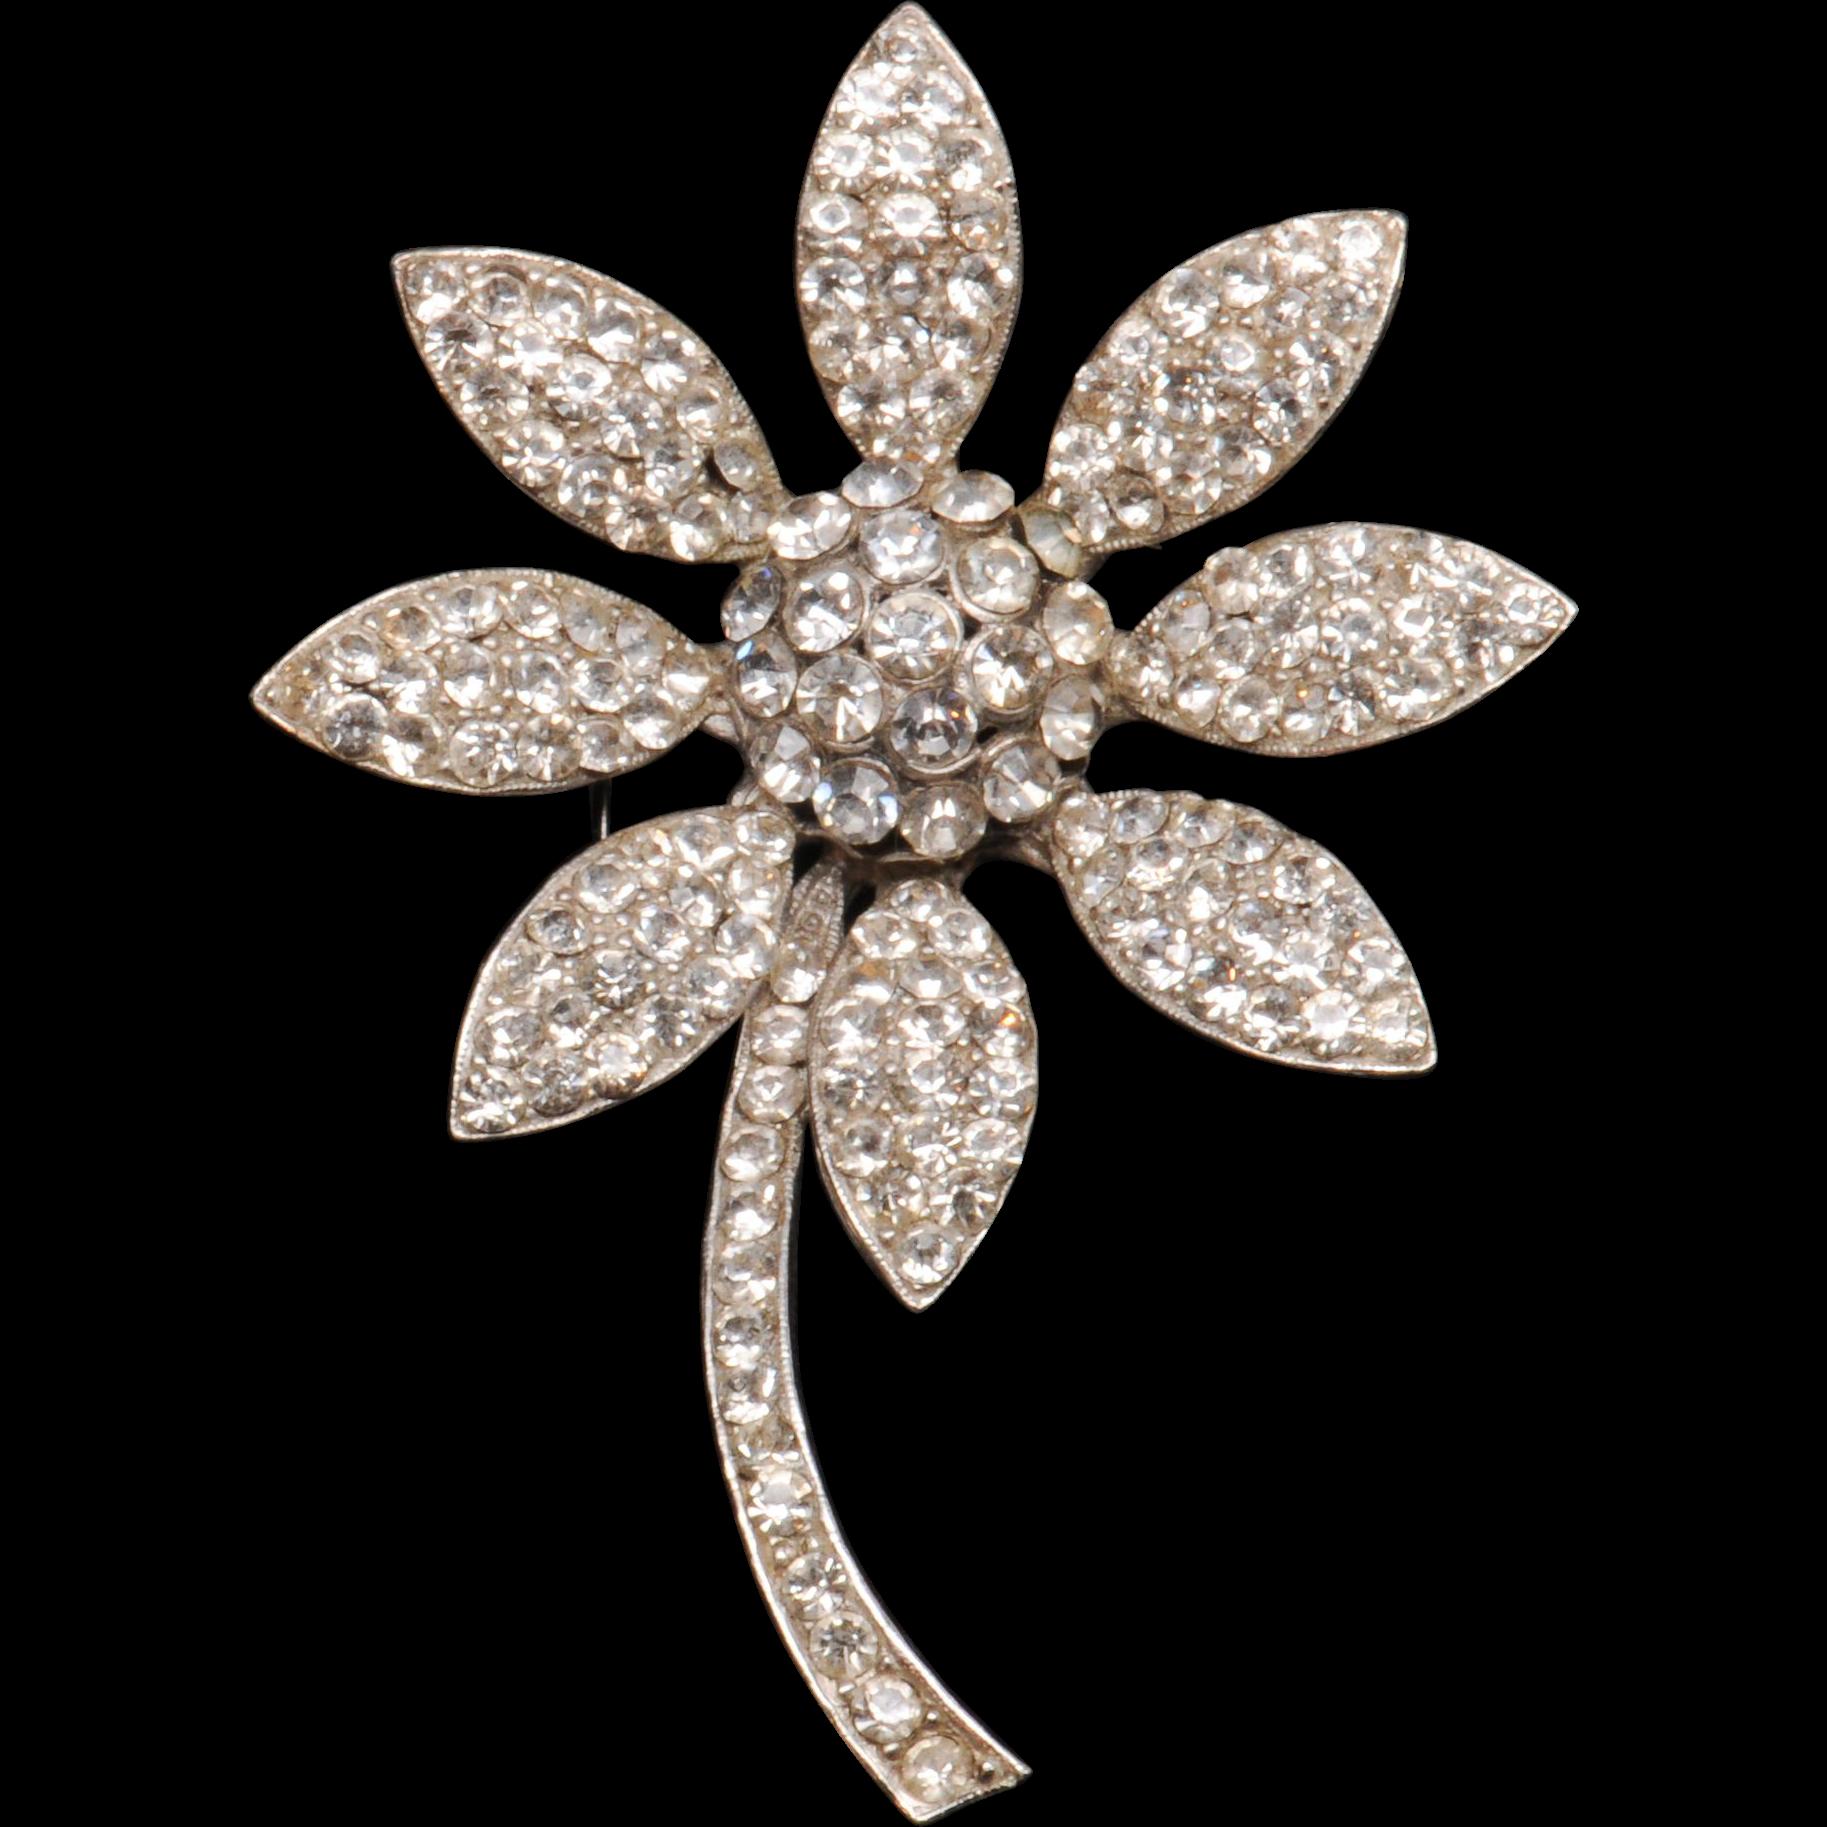 Weiss Dazzling Rhinestone Daisy Flower Pin Brooch